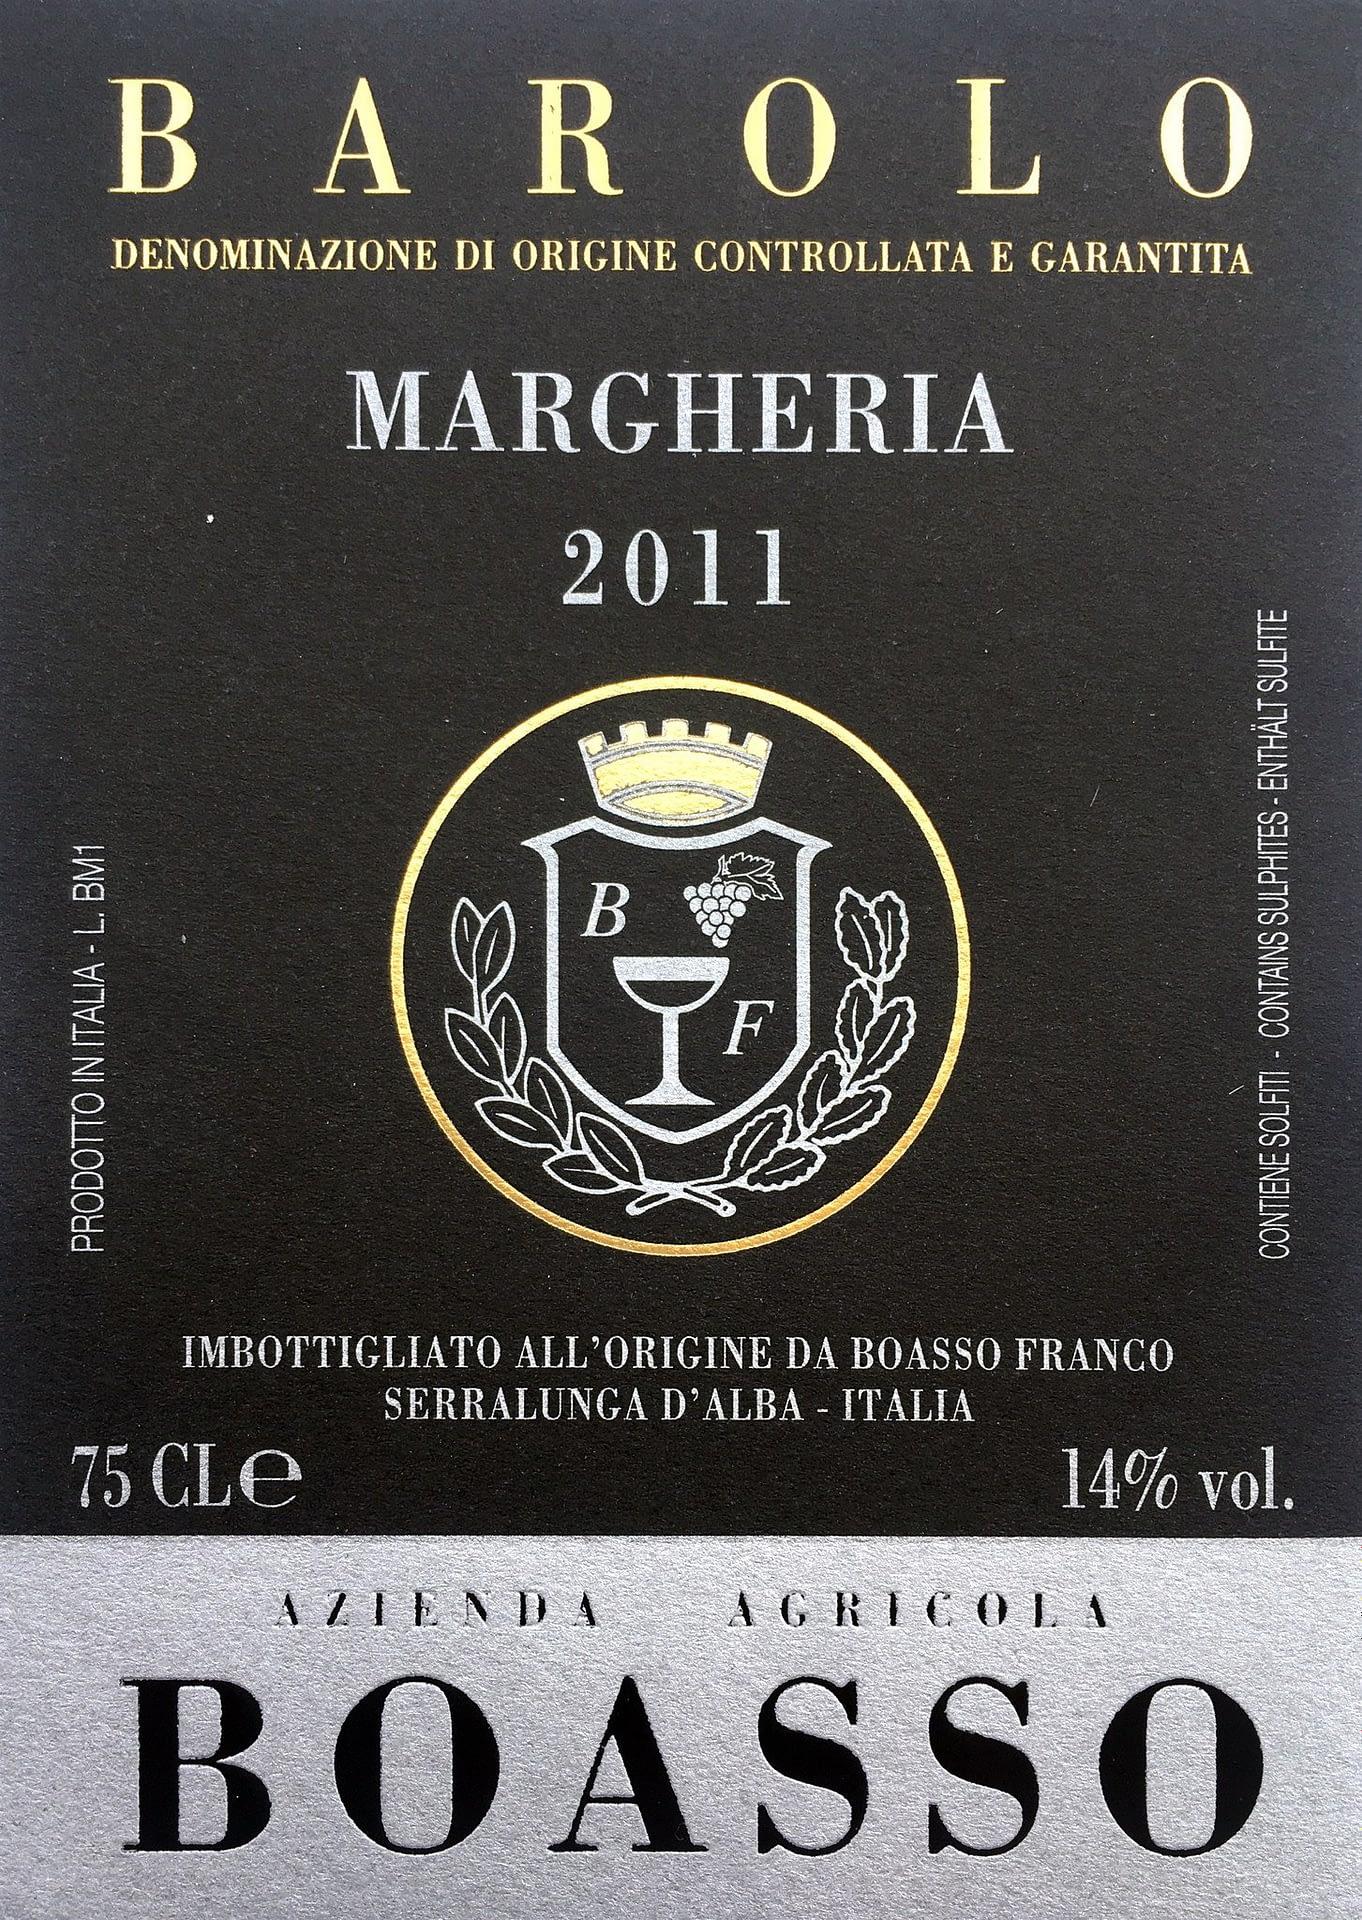 Boasso Barolo Margheria 2011